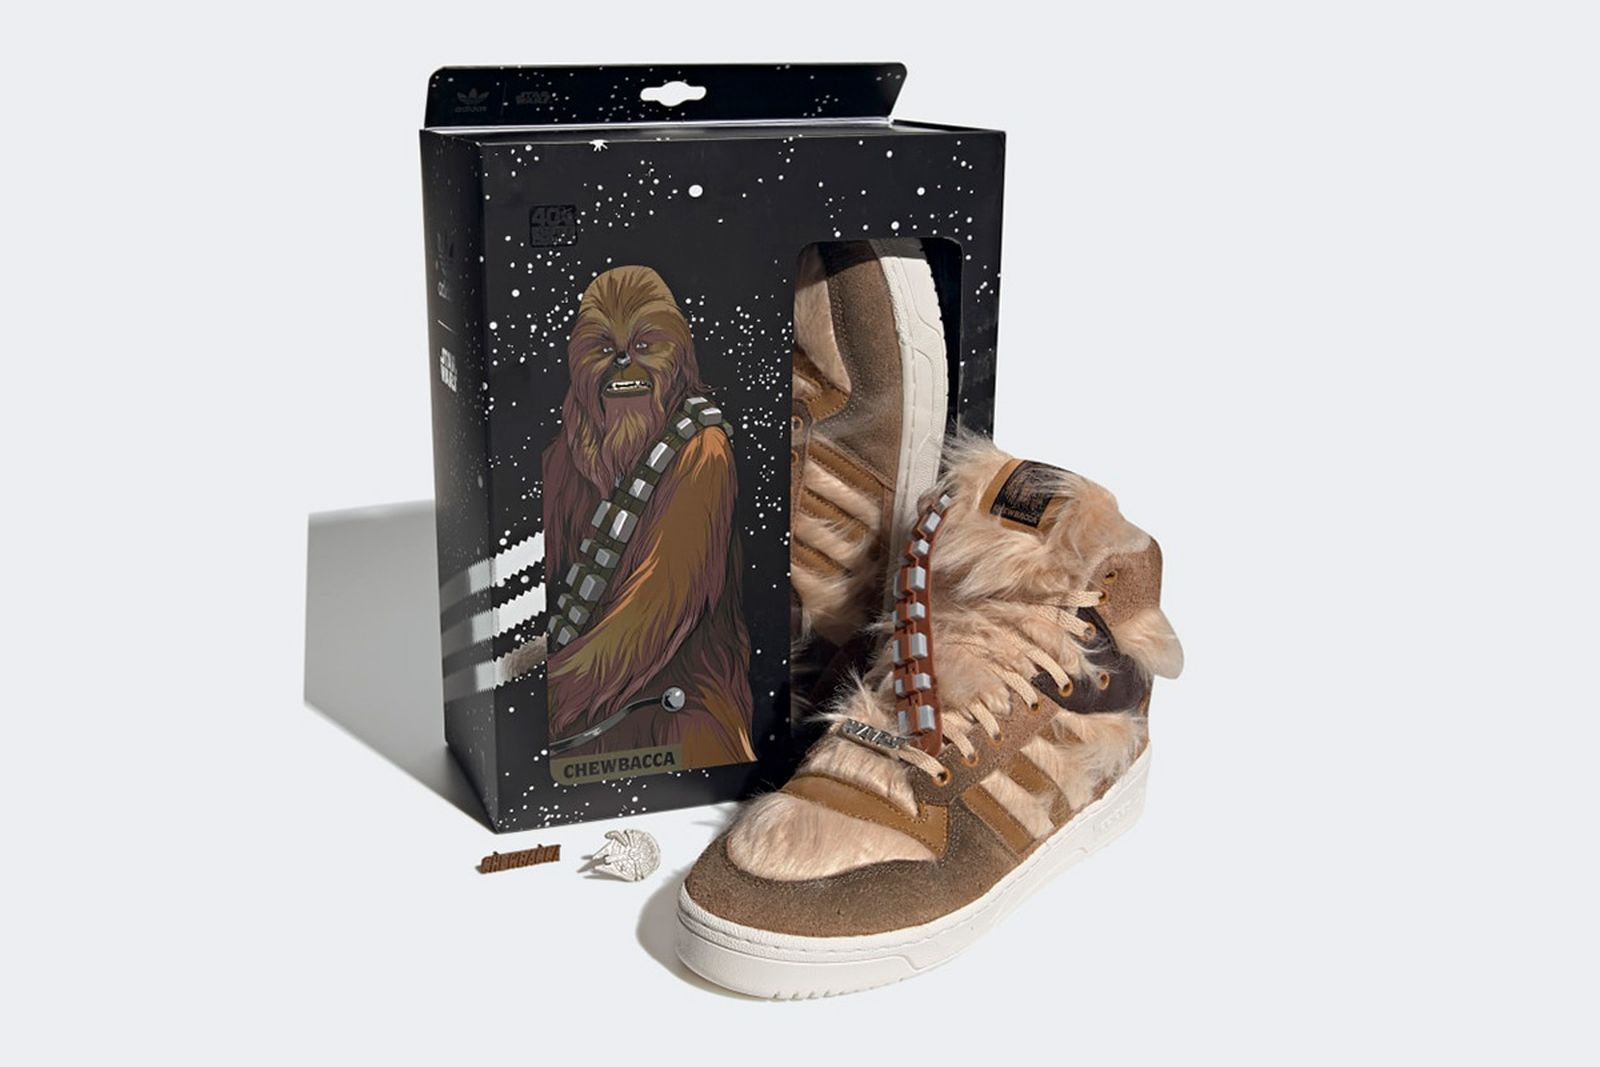 star-wars-adidas-rivalry-hi-chewbacca-release-date-price-06